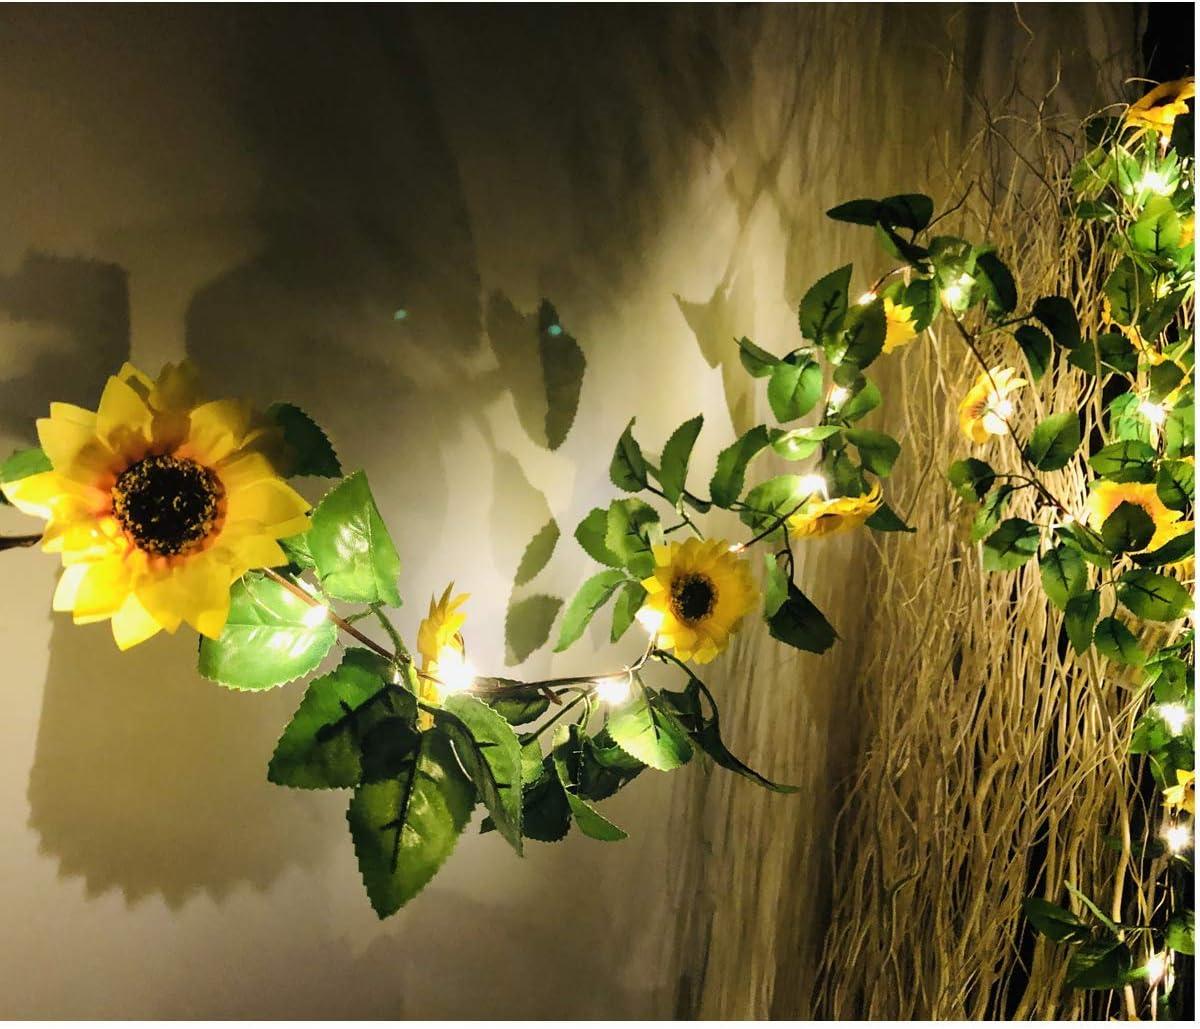 2 Pack Artificial Sunflower String Lights, Fielegen 40 LED 13 FT Sunflower Garland with Lights Battery Powered Flower Fairy String Lights for Indoor Bedroom Wedding Home Garden Decor